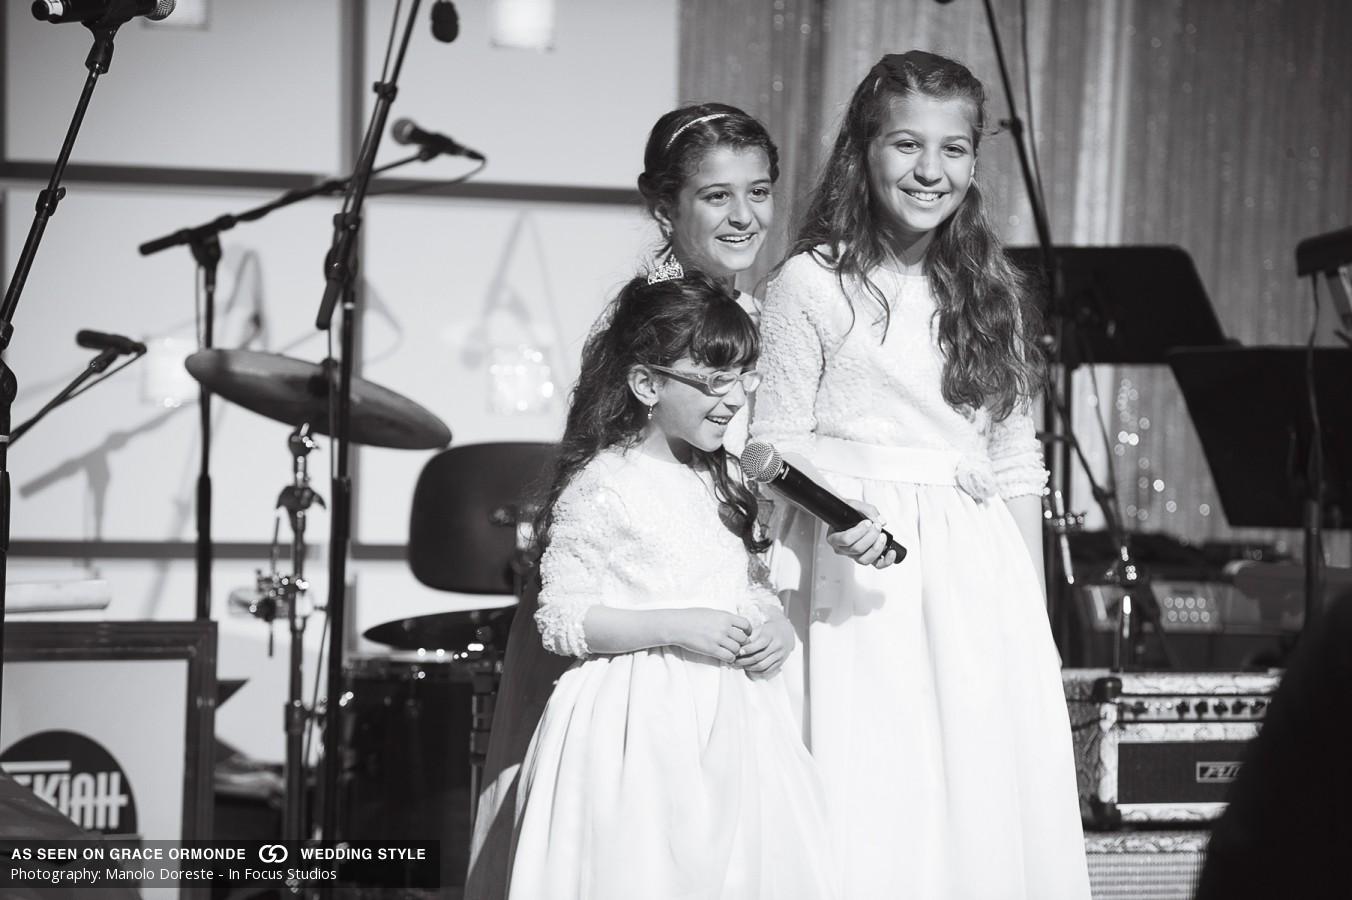 manolo-doreste-wedding-ss14-014.jpg